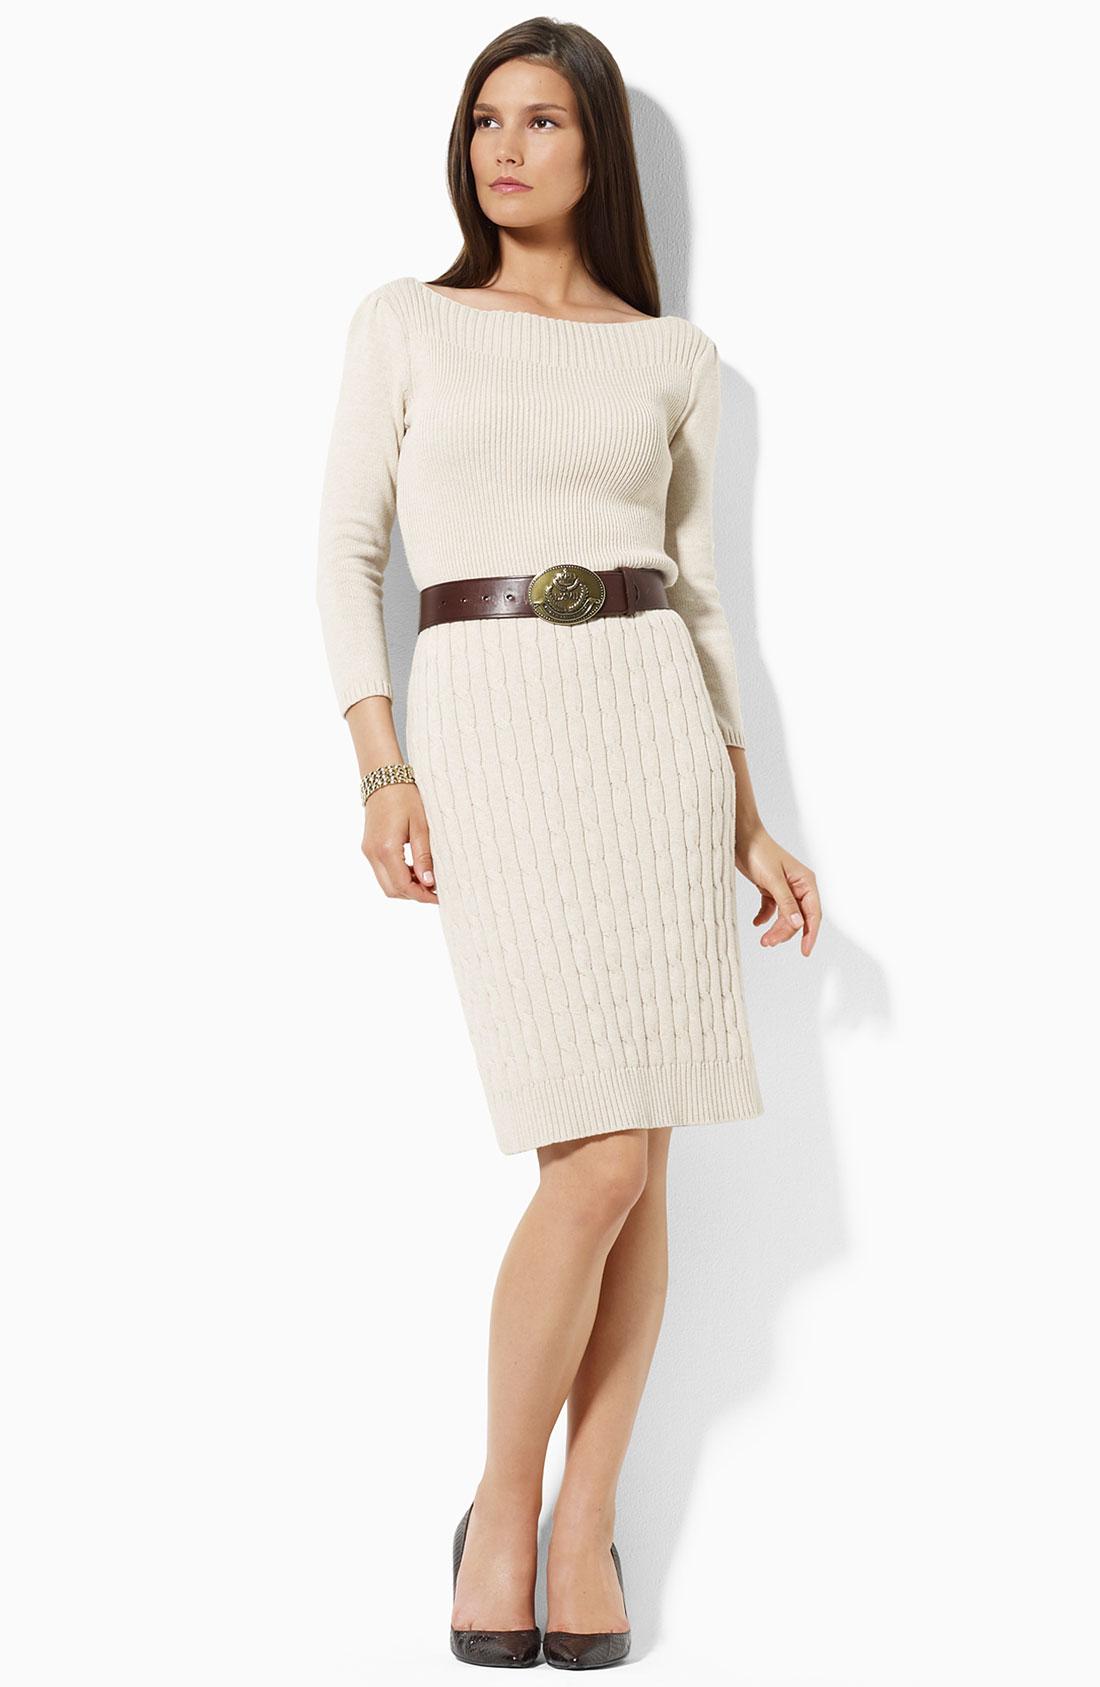 lauren by ralph lauren sweater dress in beige oatmeal heather lyst. Black Bedroom Furniture Sets. Home Design Ideas